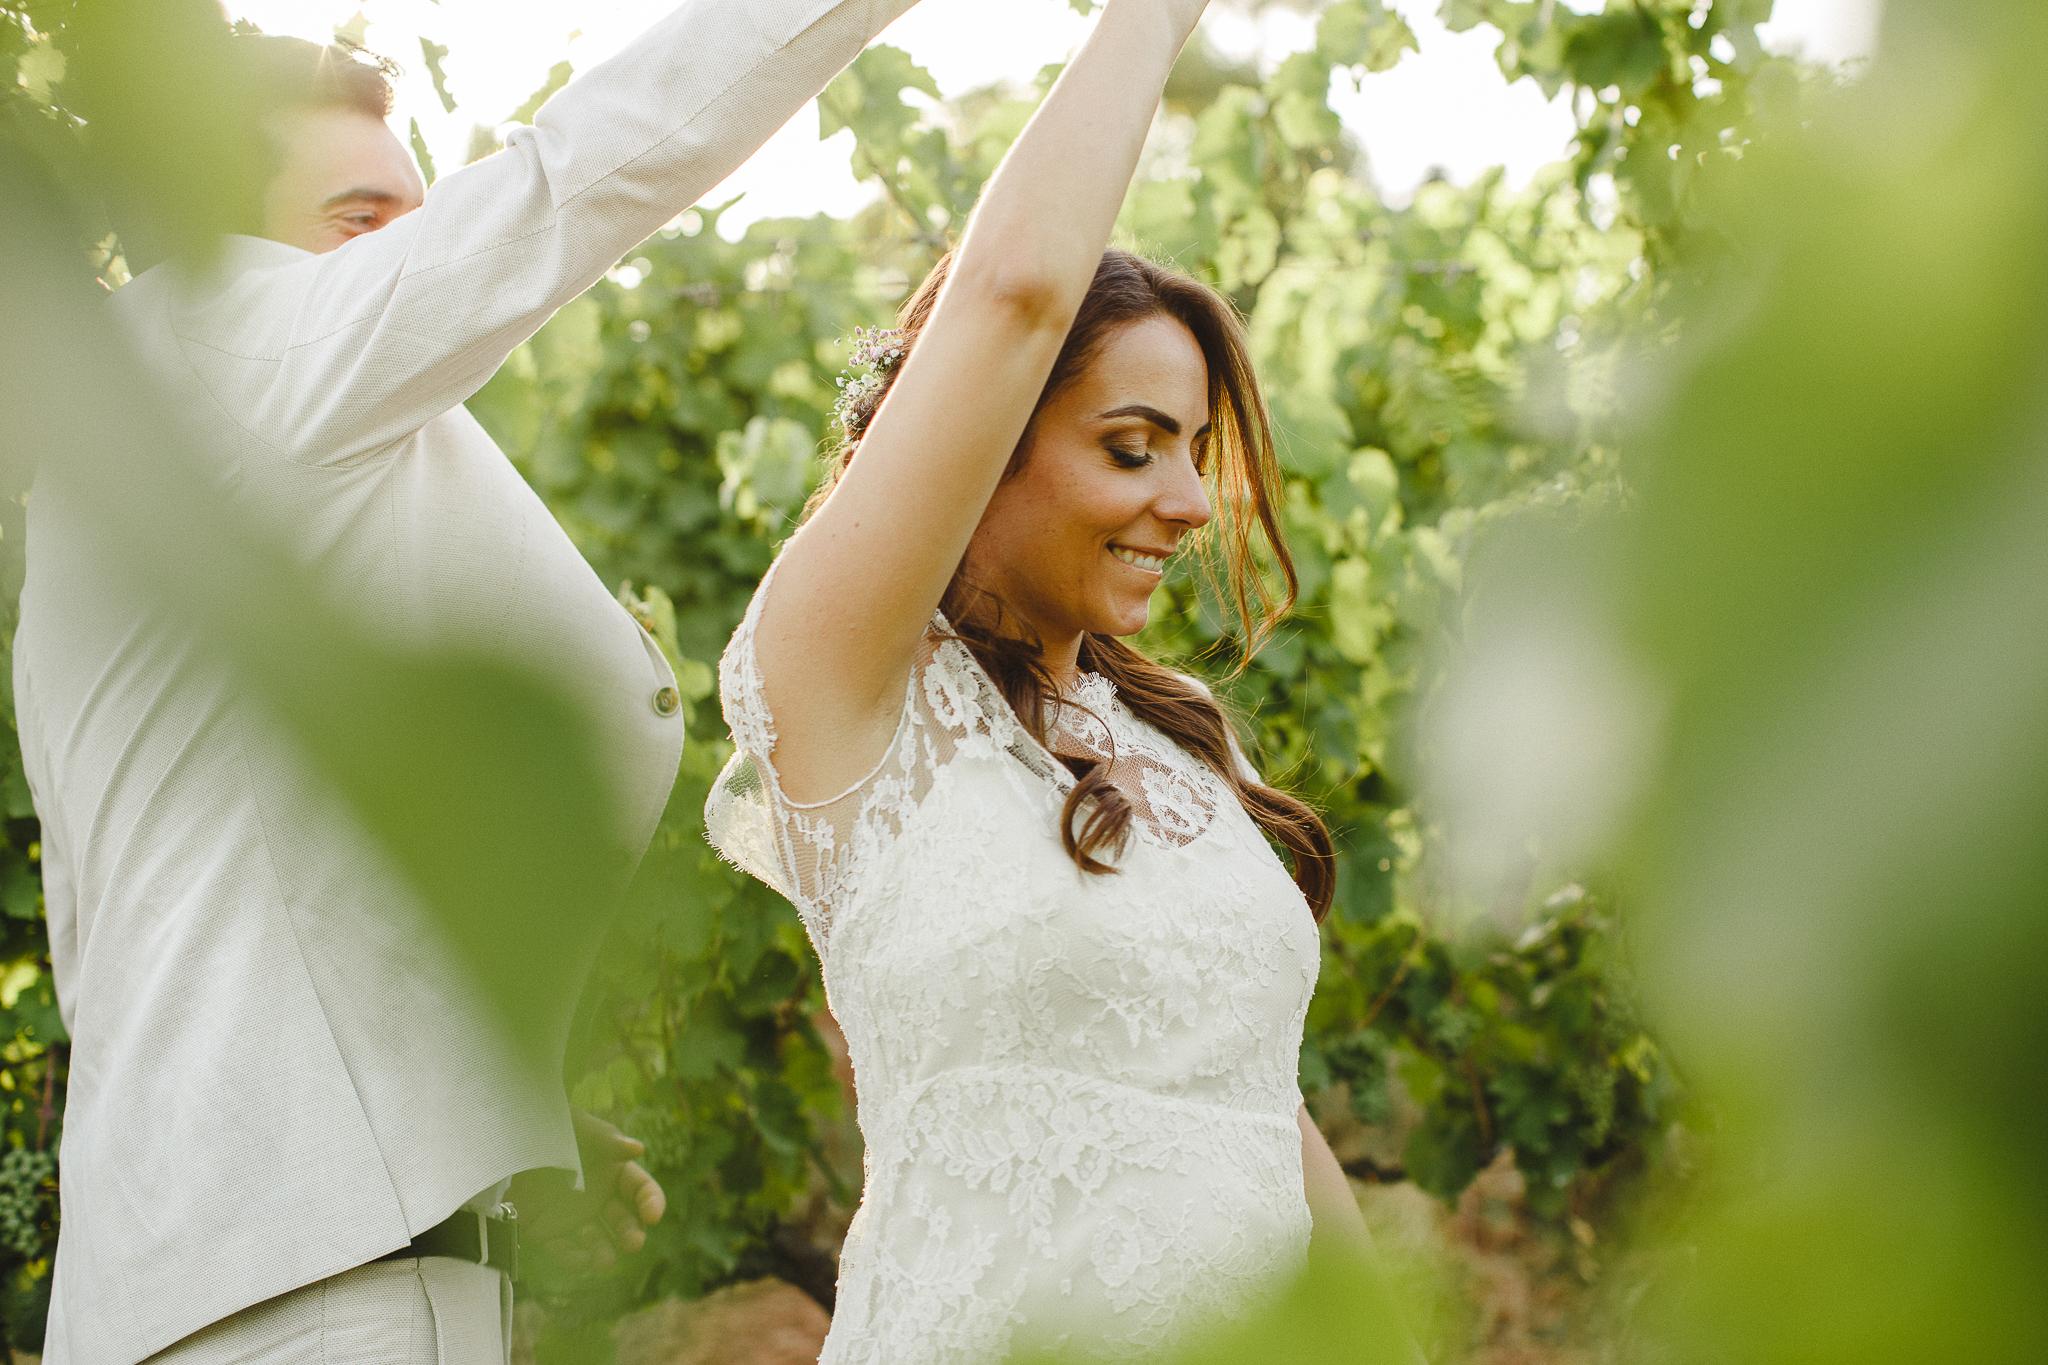 Destination Wedding Portugal, Wedding Quinta de Santana, Fotografia de Casamento Documental, Fotojornalista de Casamento Portugal - Hello Twiggs